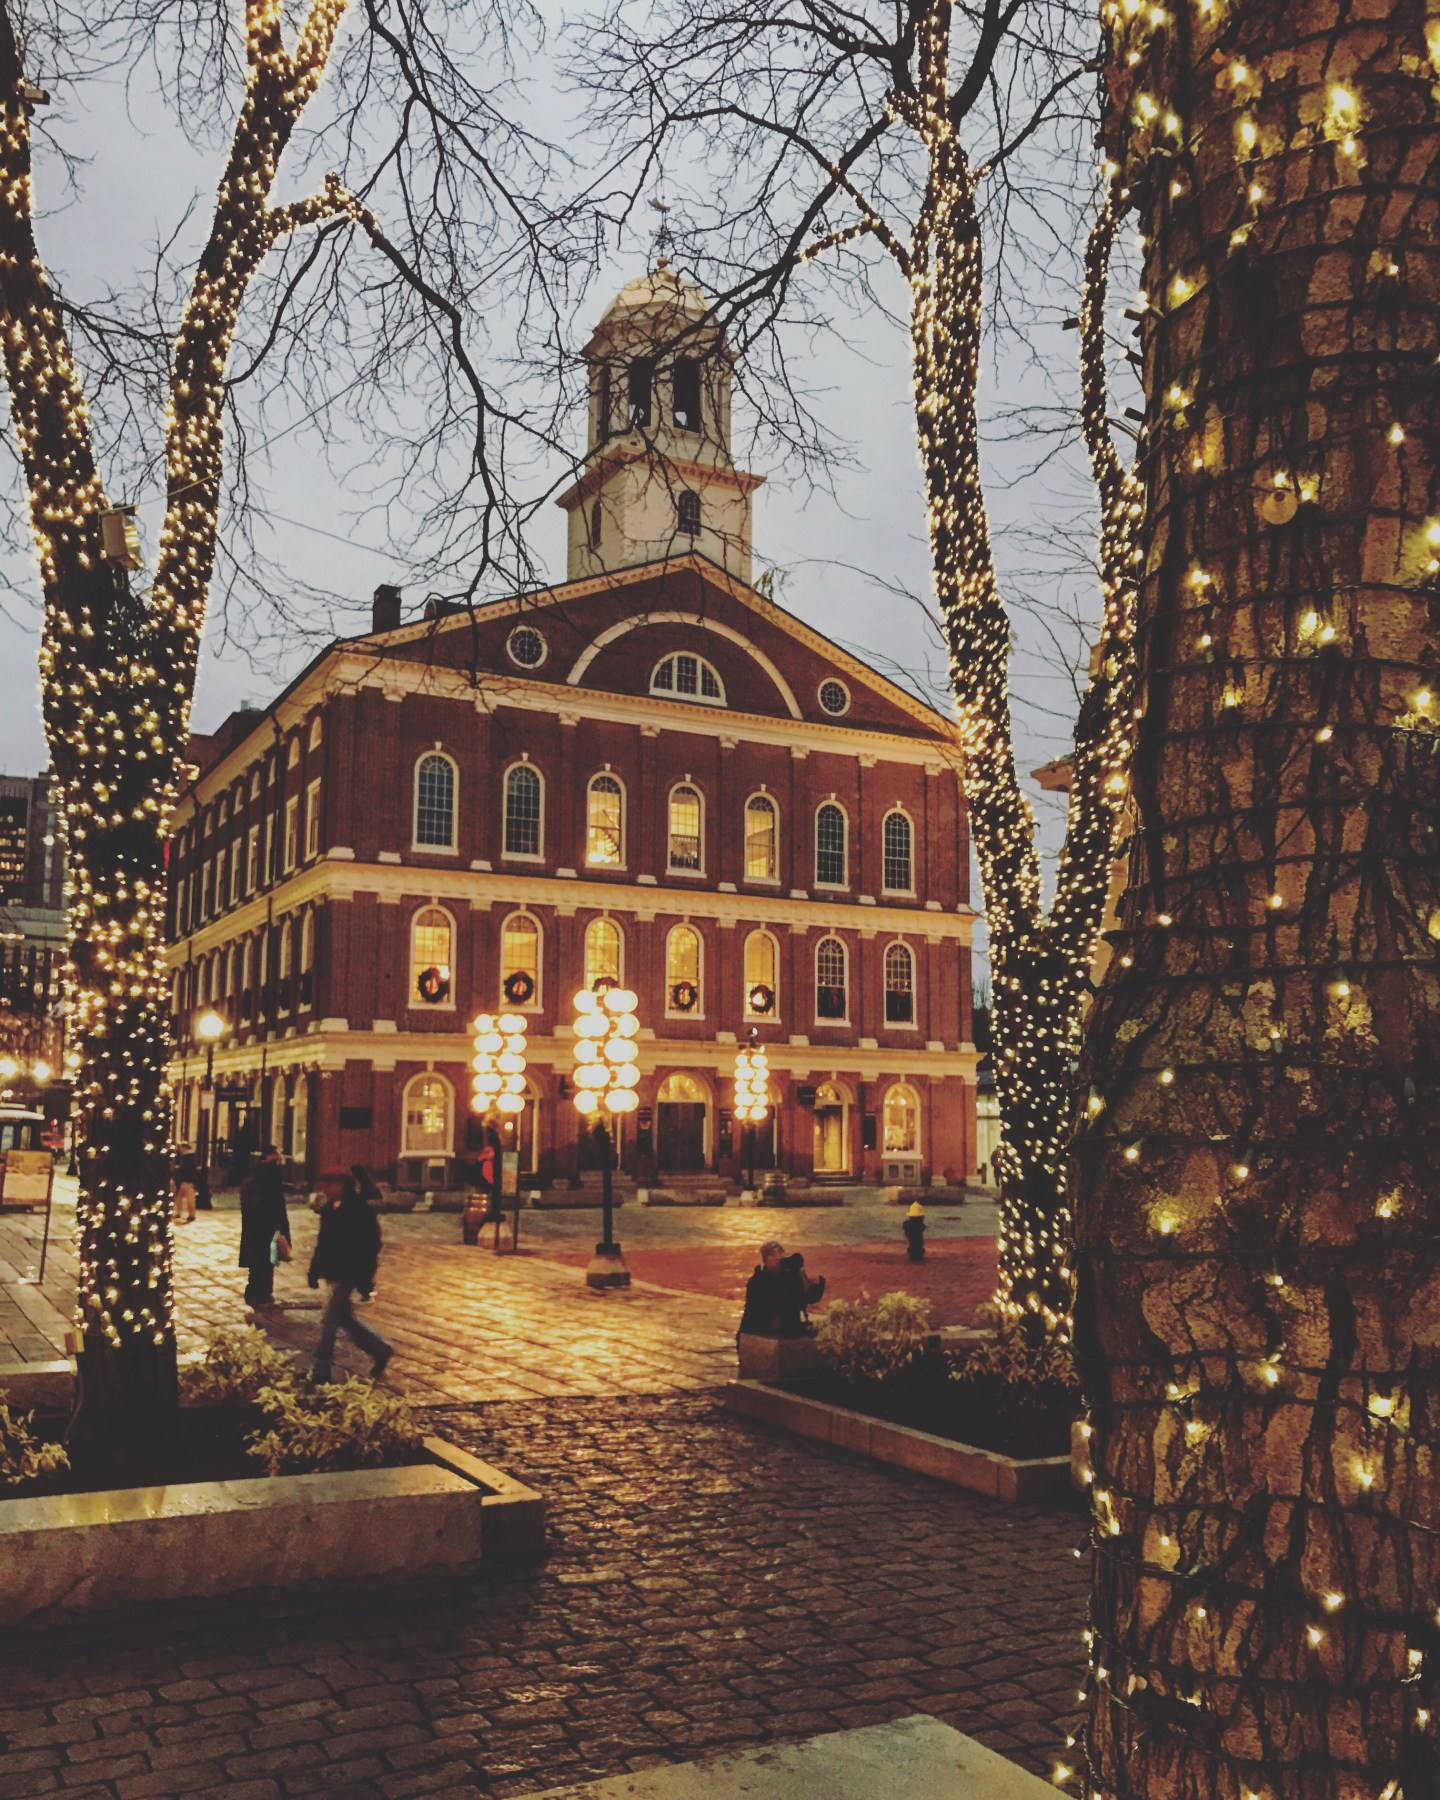 Instagramming Boston